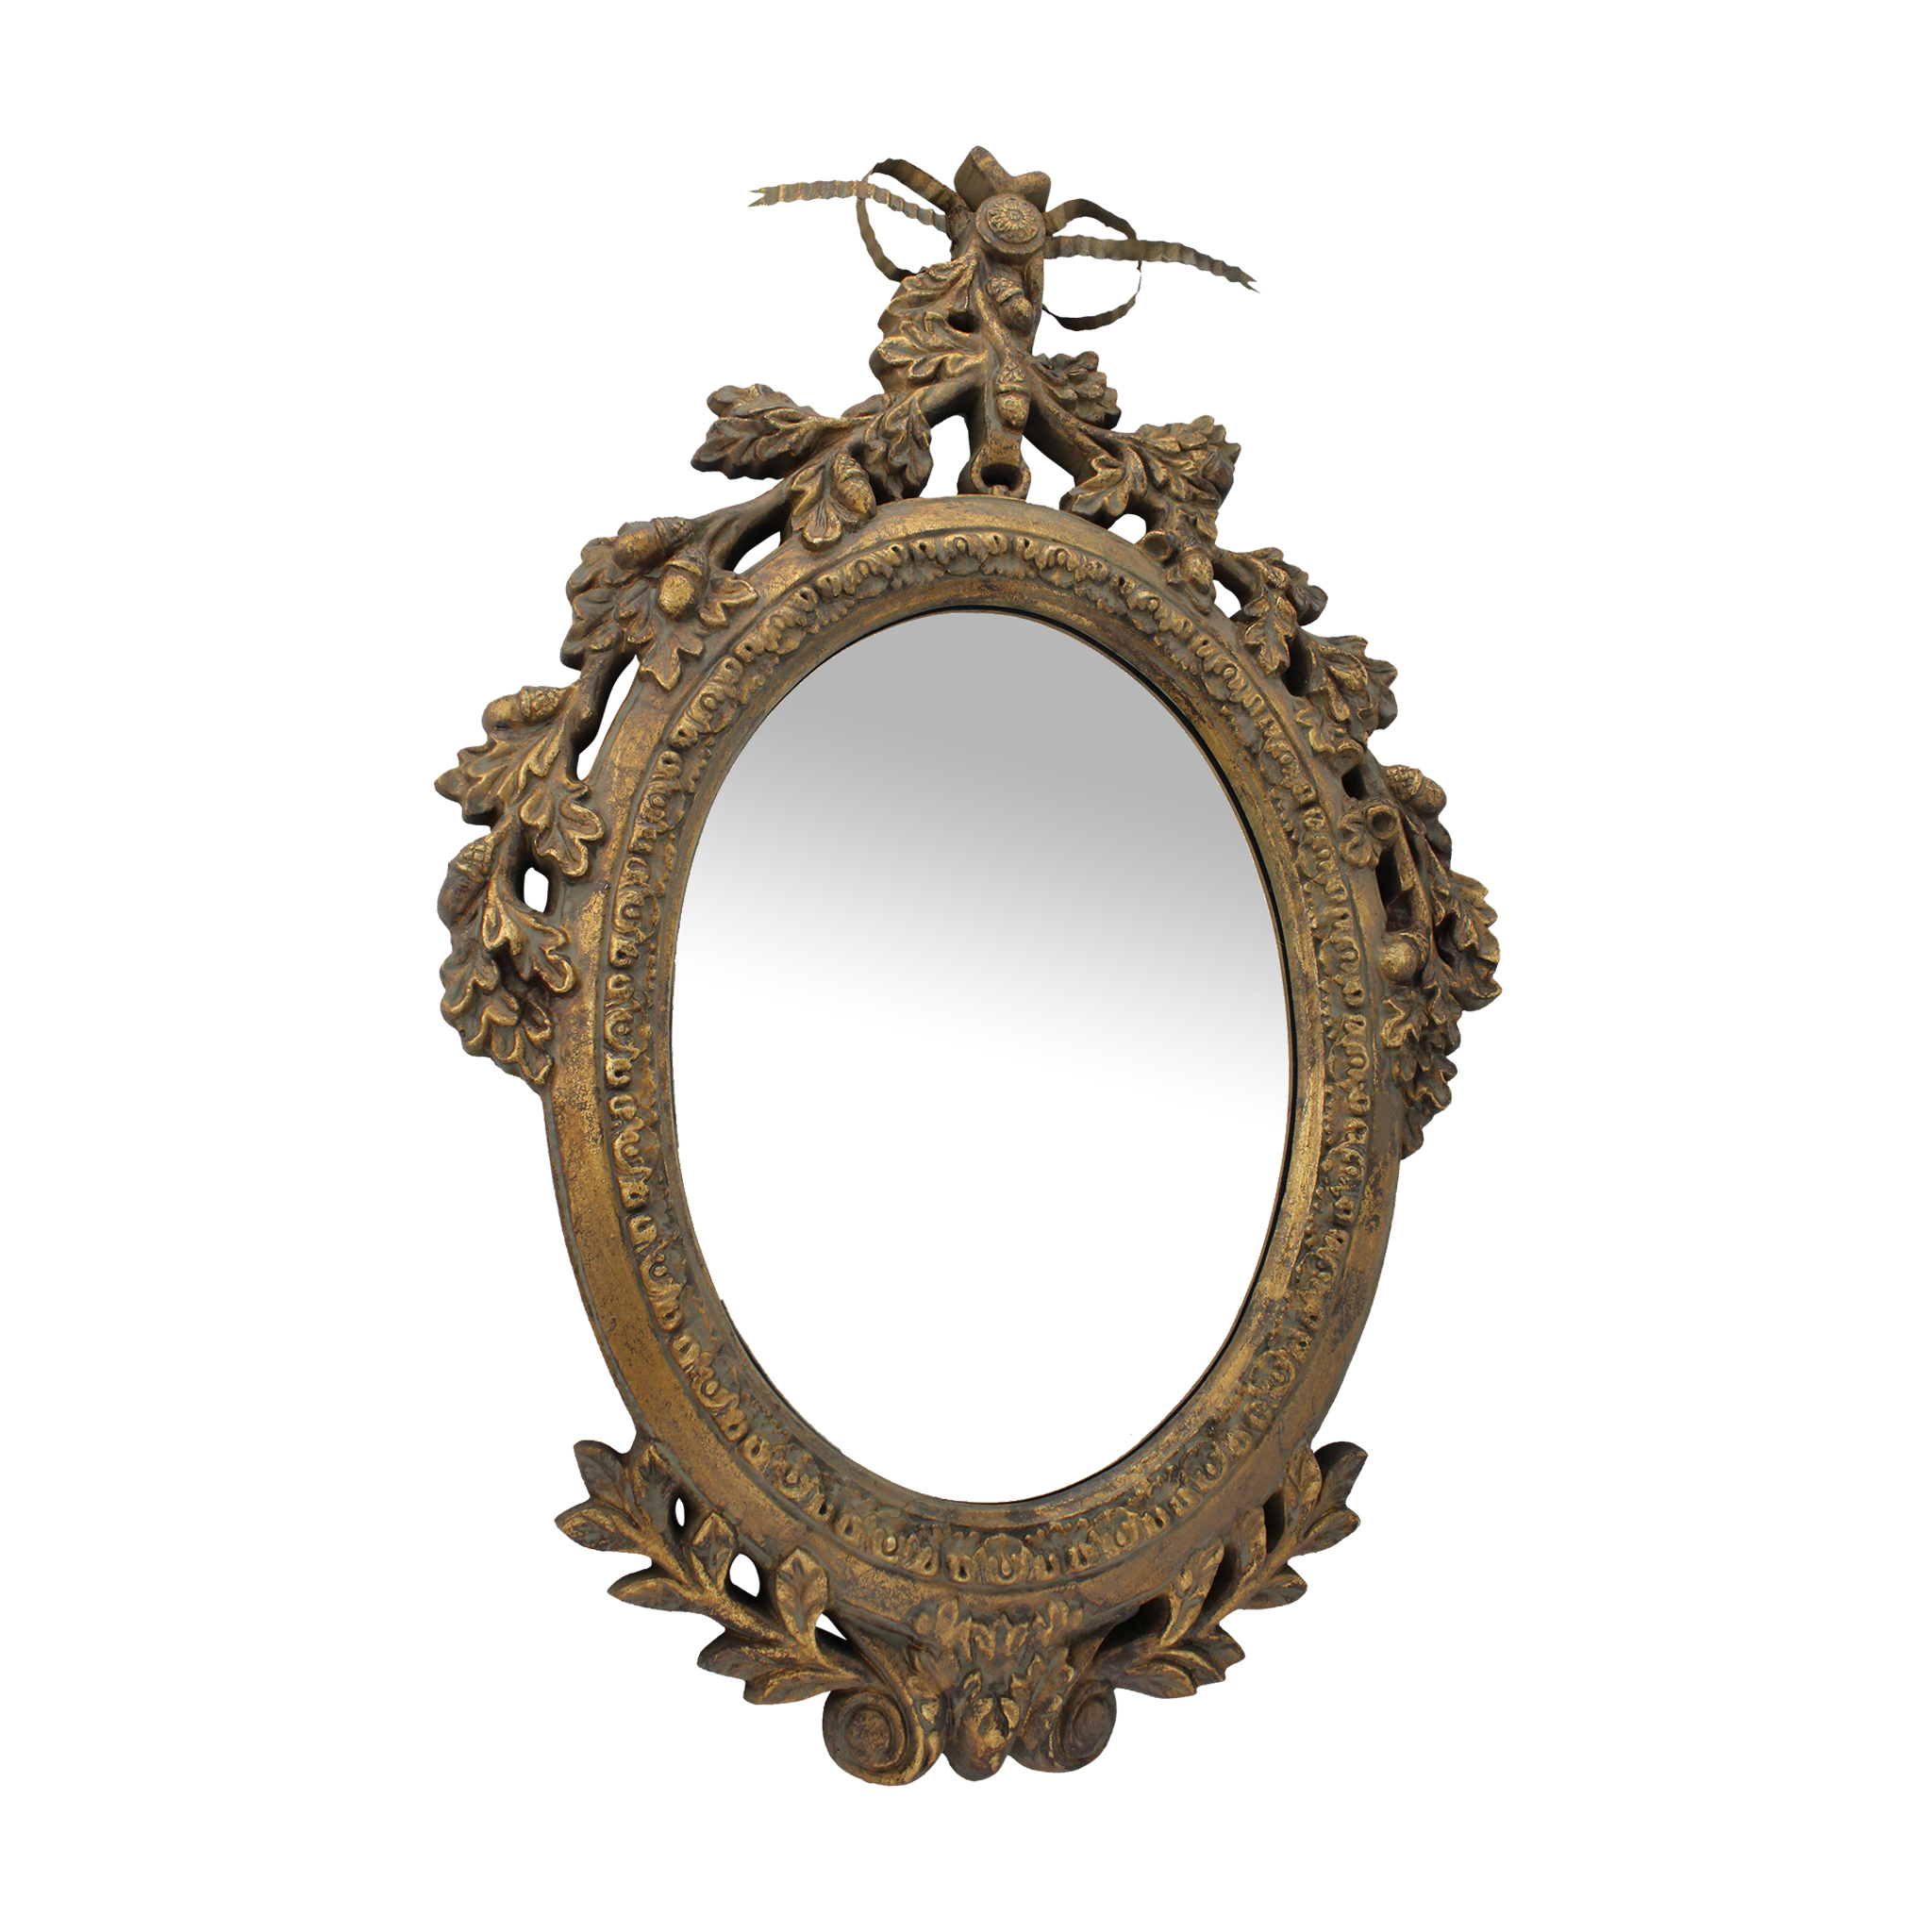 Oglinda Ovala Retro Din Lemn Auriu 60 Cm